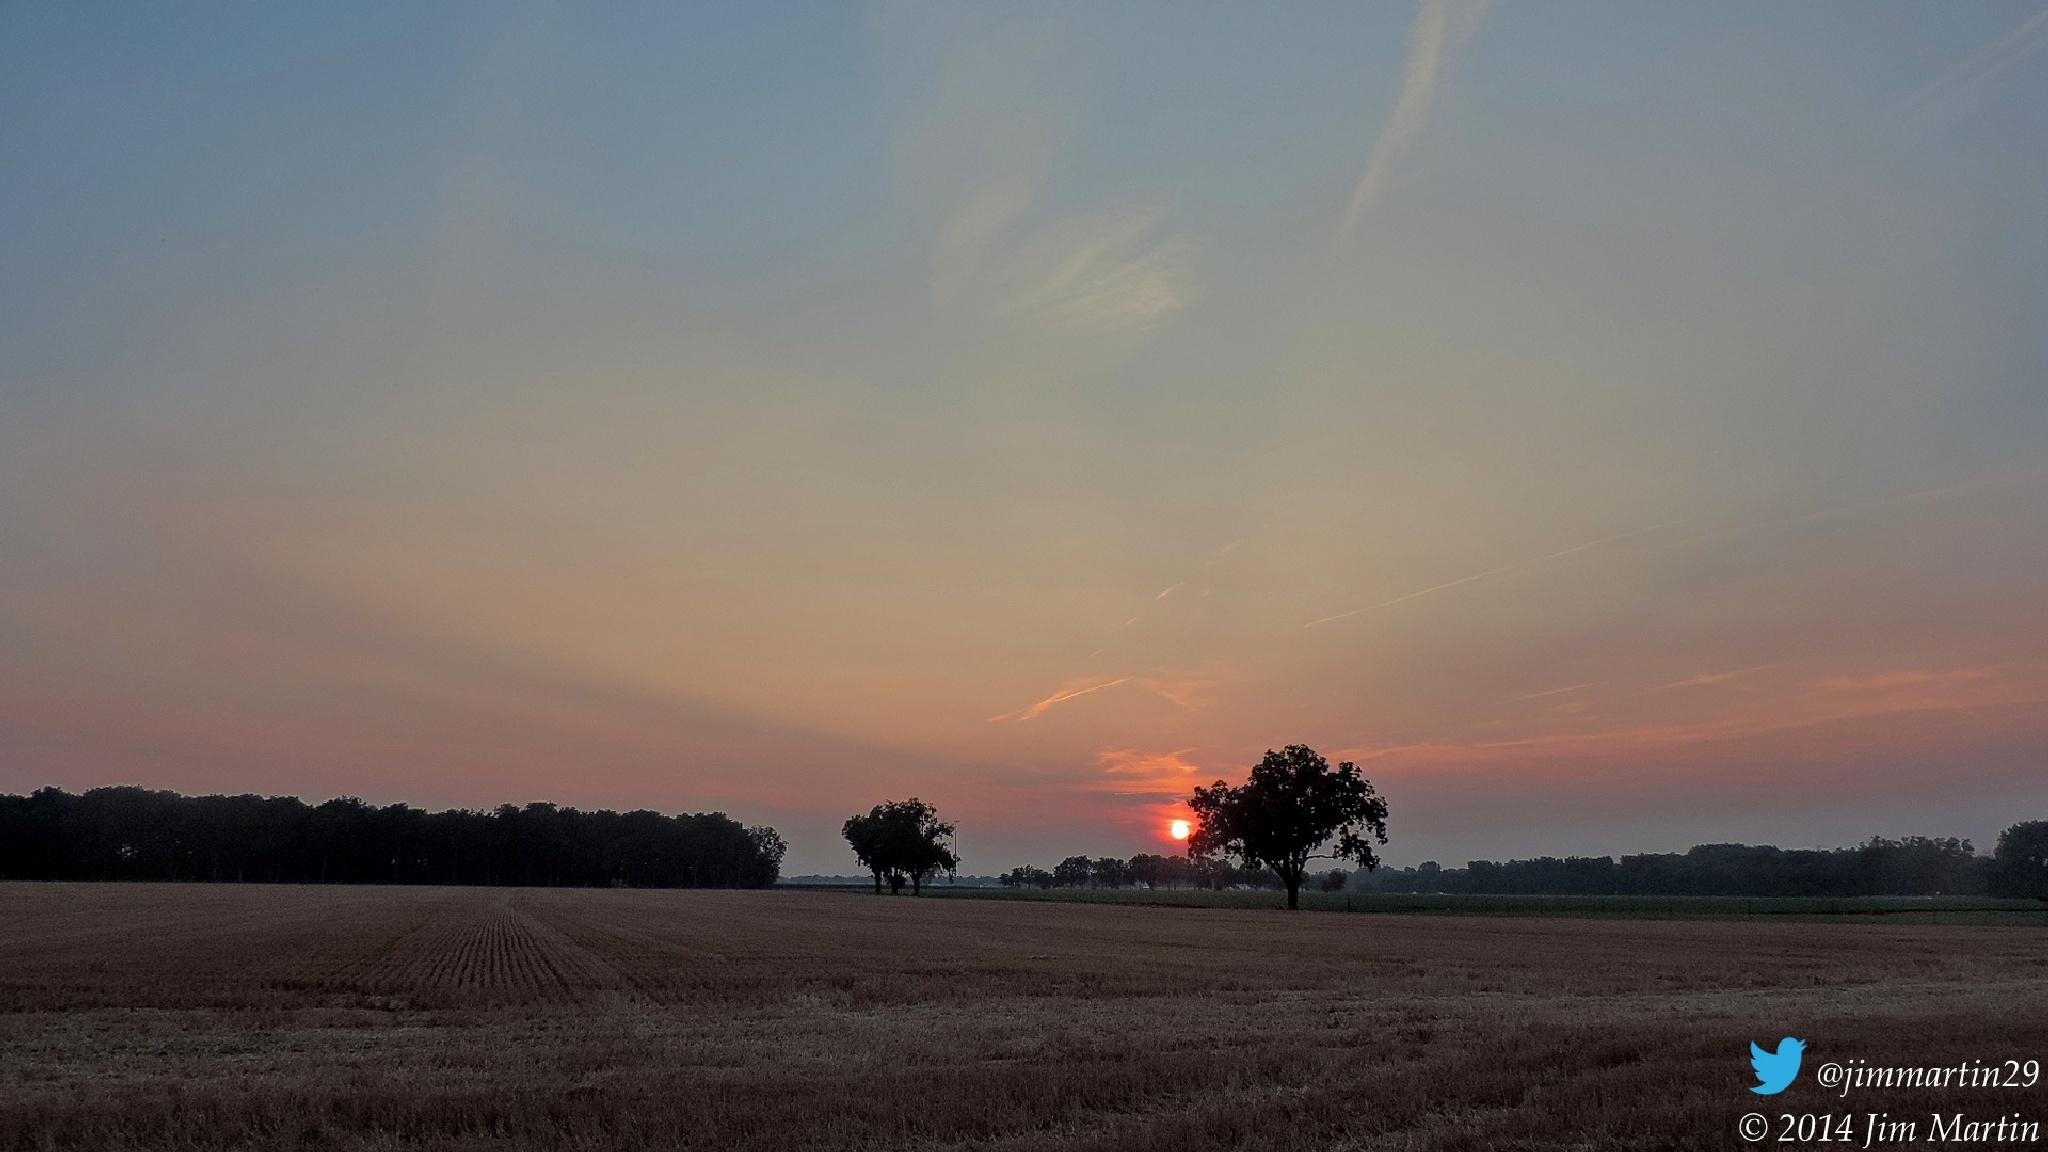 Hazy Sunset by Jim Martin